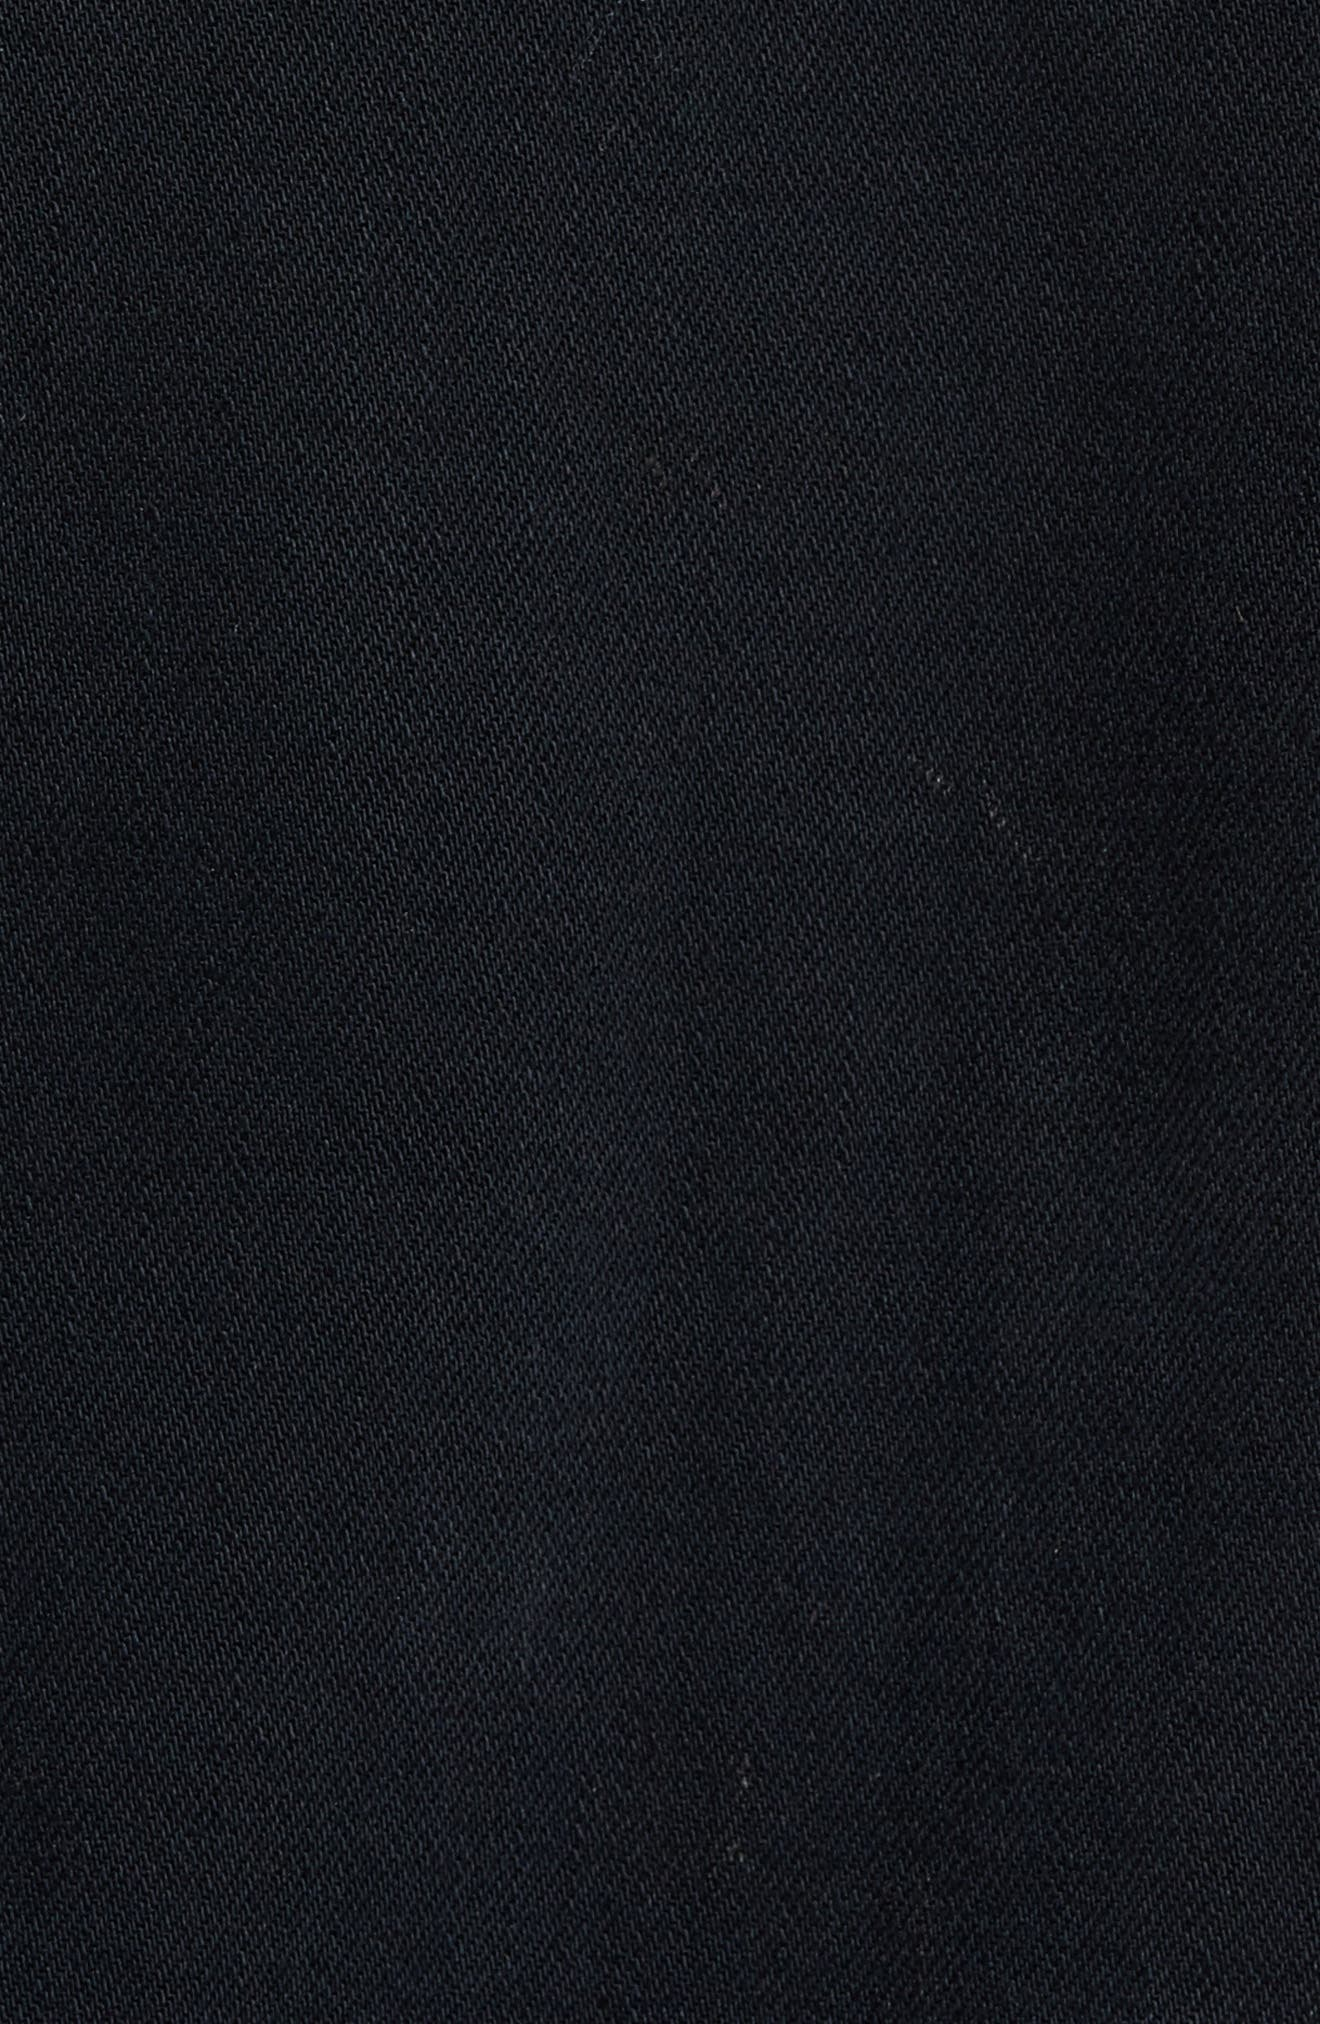 Scout Denim Jacket,                             Alternate thumbnail 5, color,                             Black Gold